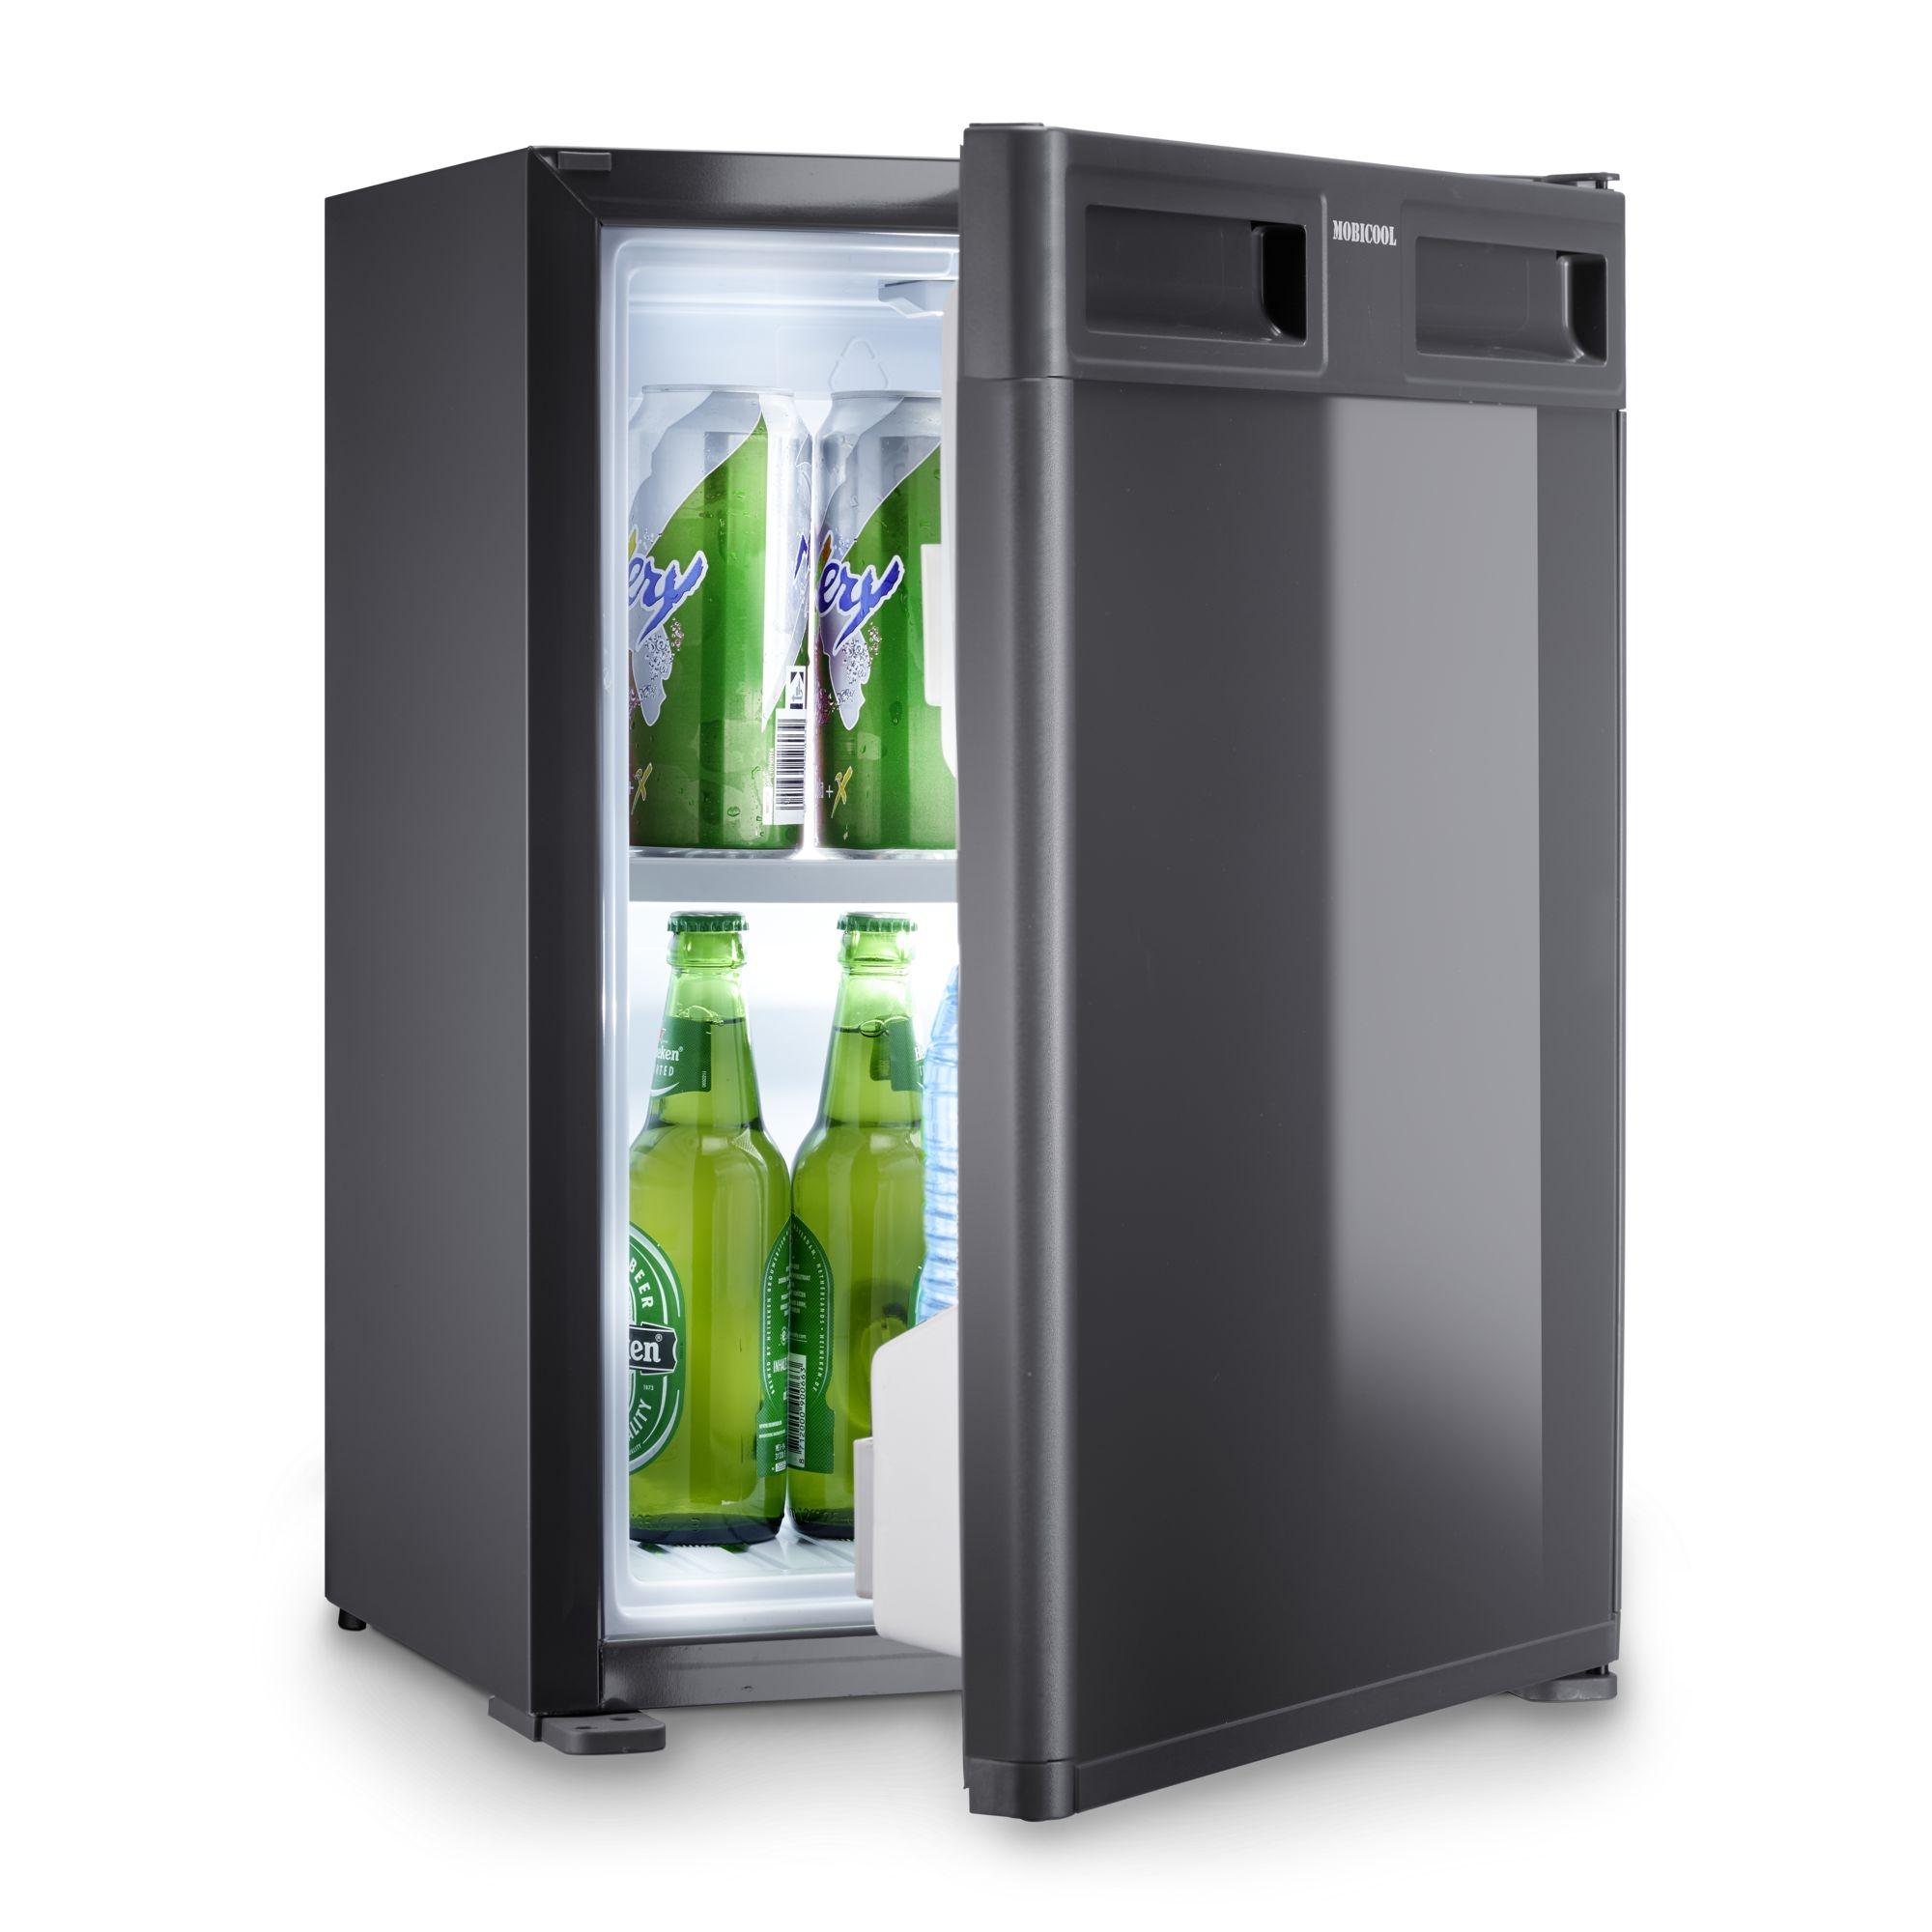 Minibar Mobicool 30 Liter Online-Shop GASTRO-HELD Austria